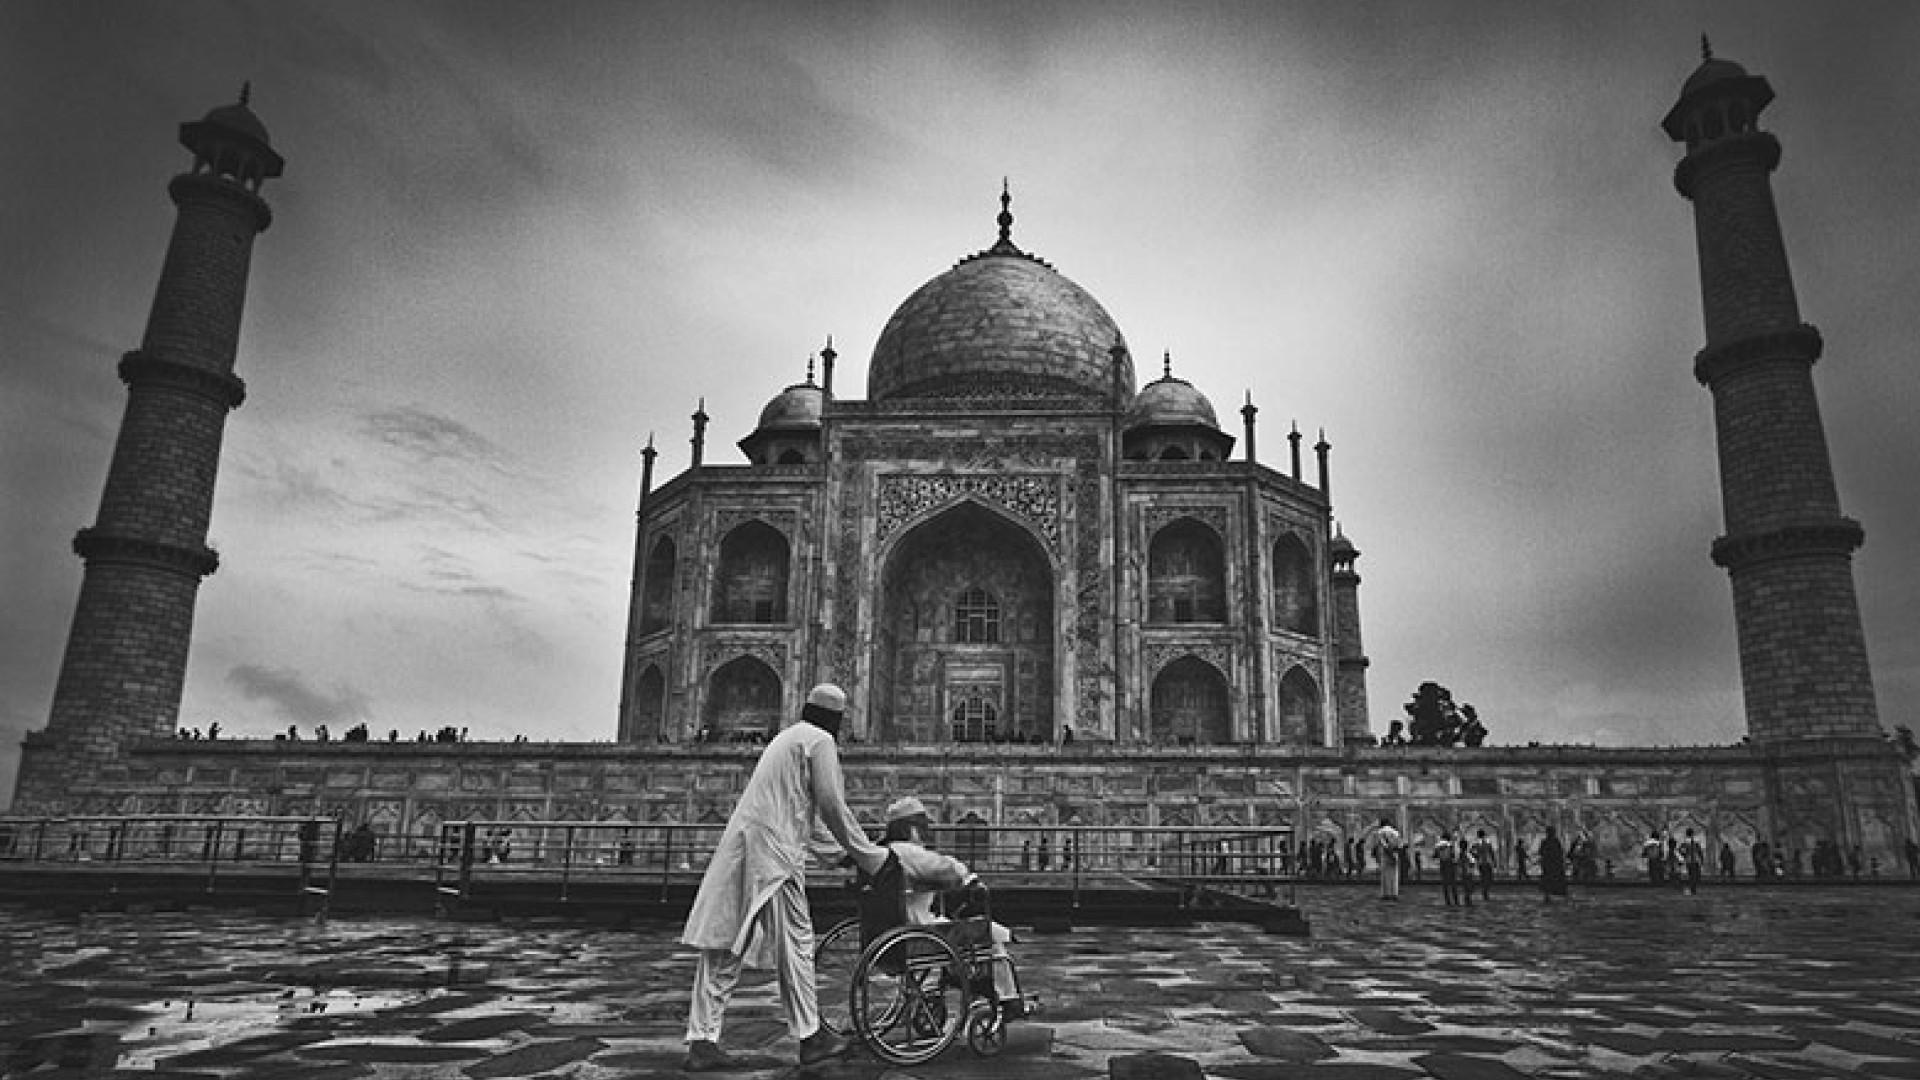 130681236857205817_Kumar-Bishwajit_Bangladesh_Shortlisted_Open_Travel_2015